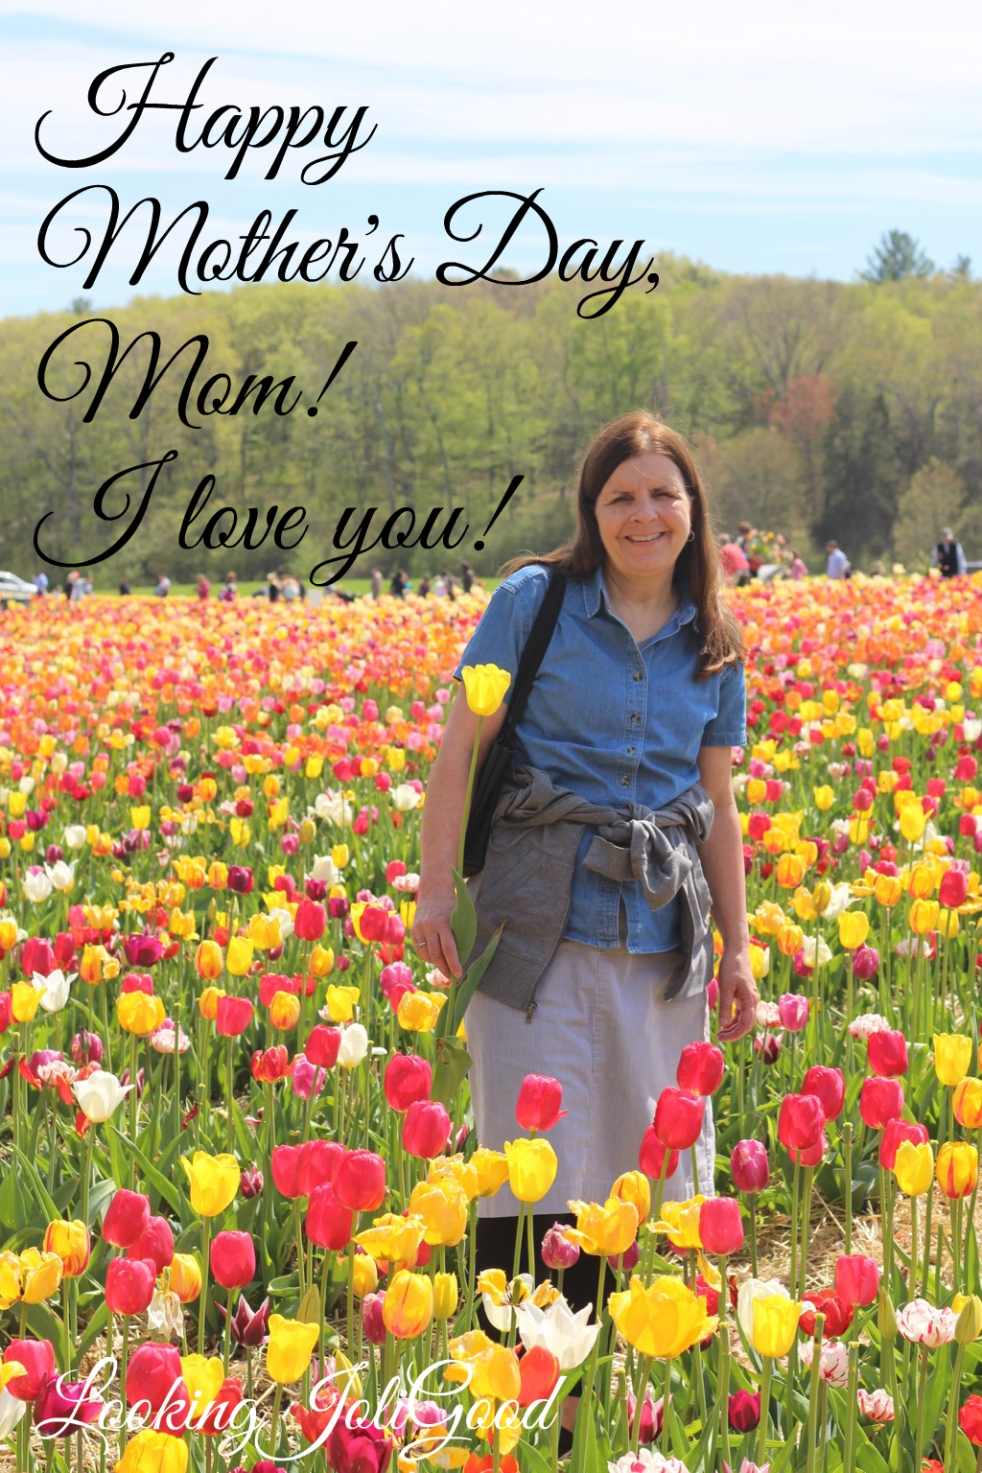 mothers day | lookingjoligood.blog